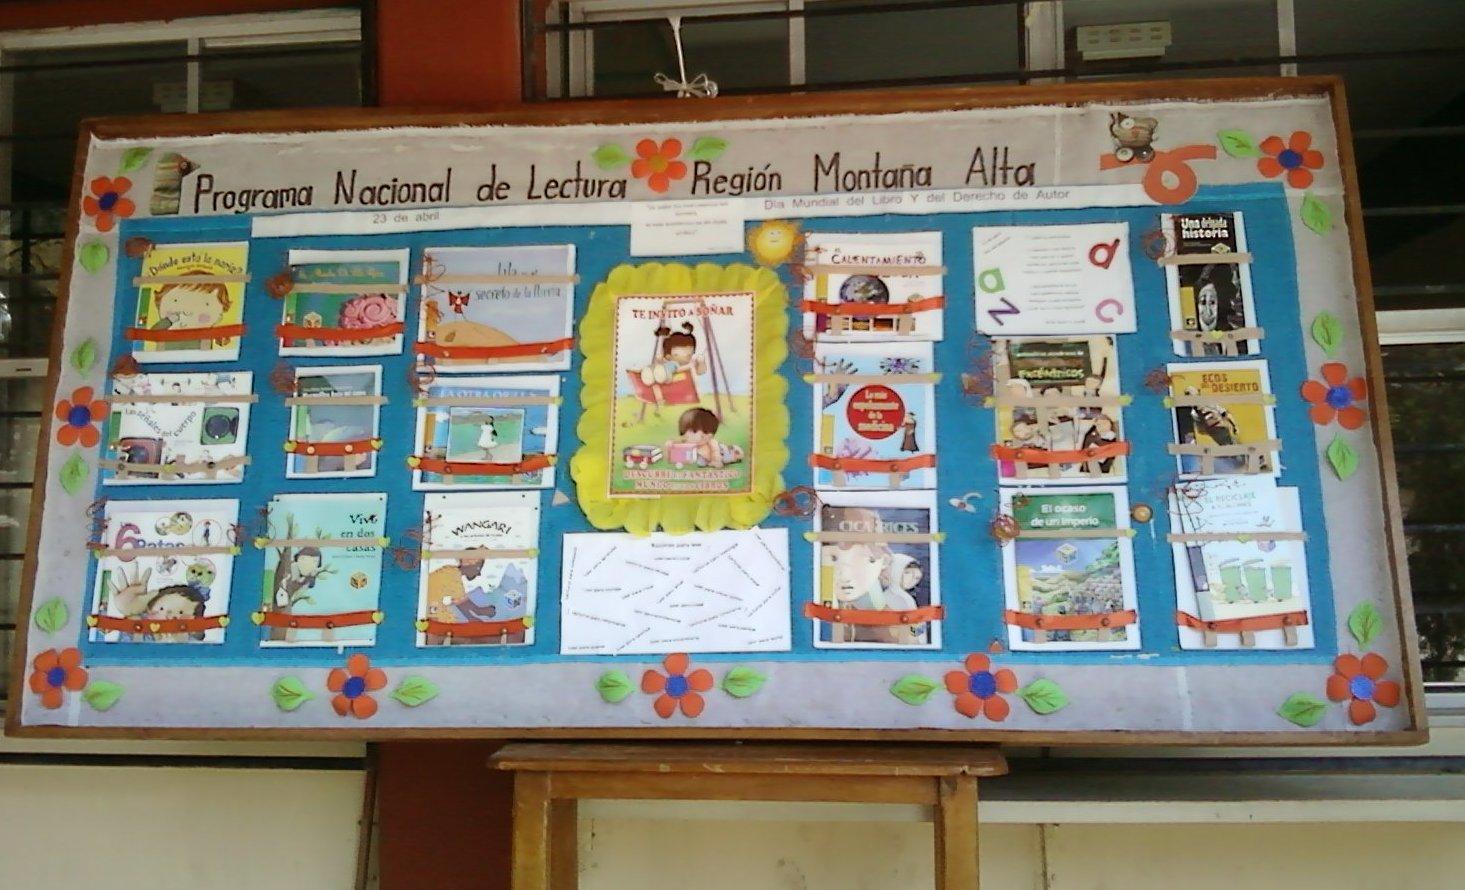 Programa nacional de lectura regi n monta a alta de for Estructura del periodico mural